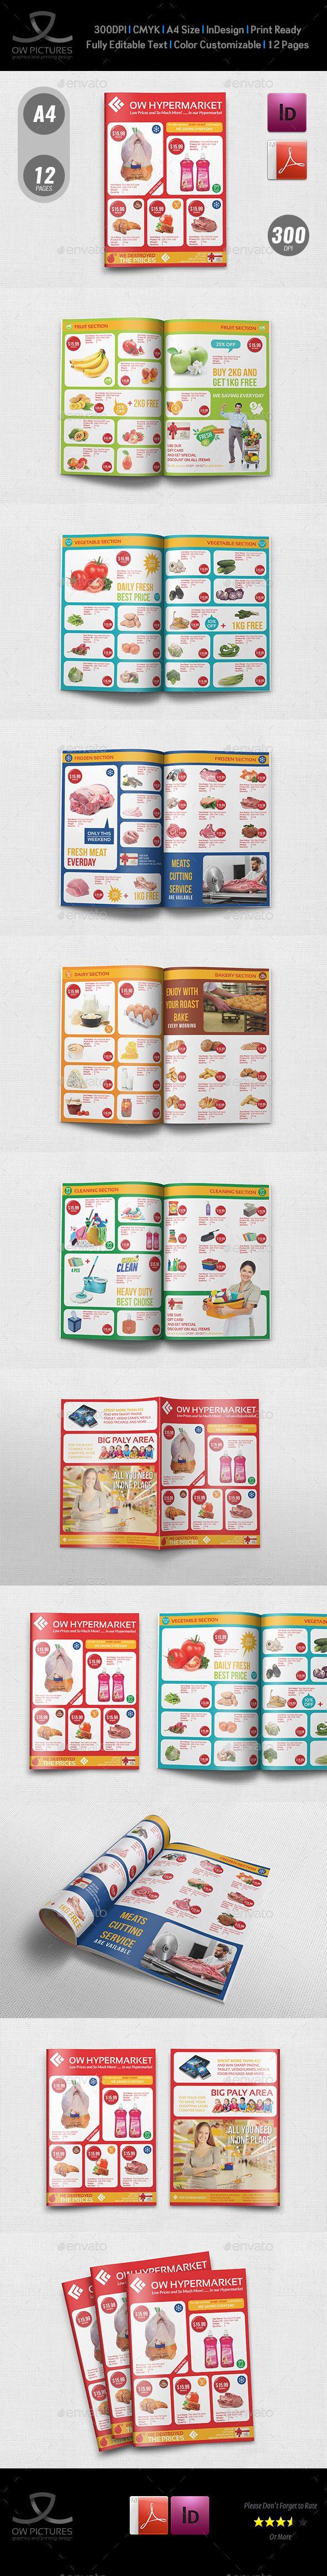 Supermarket Catalog Brochure Template Vol.4  12 Pages — InDesign INDD #products #vegetables • Download ➝ https://graphicriver.net/item/supermarket-catalog-brochure-template-vol4-12-pages/19235857?ref=pxcr